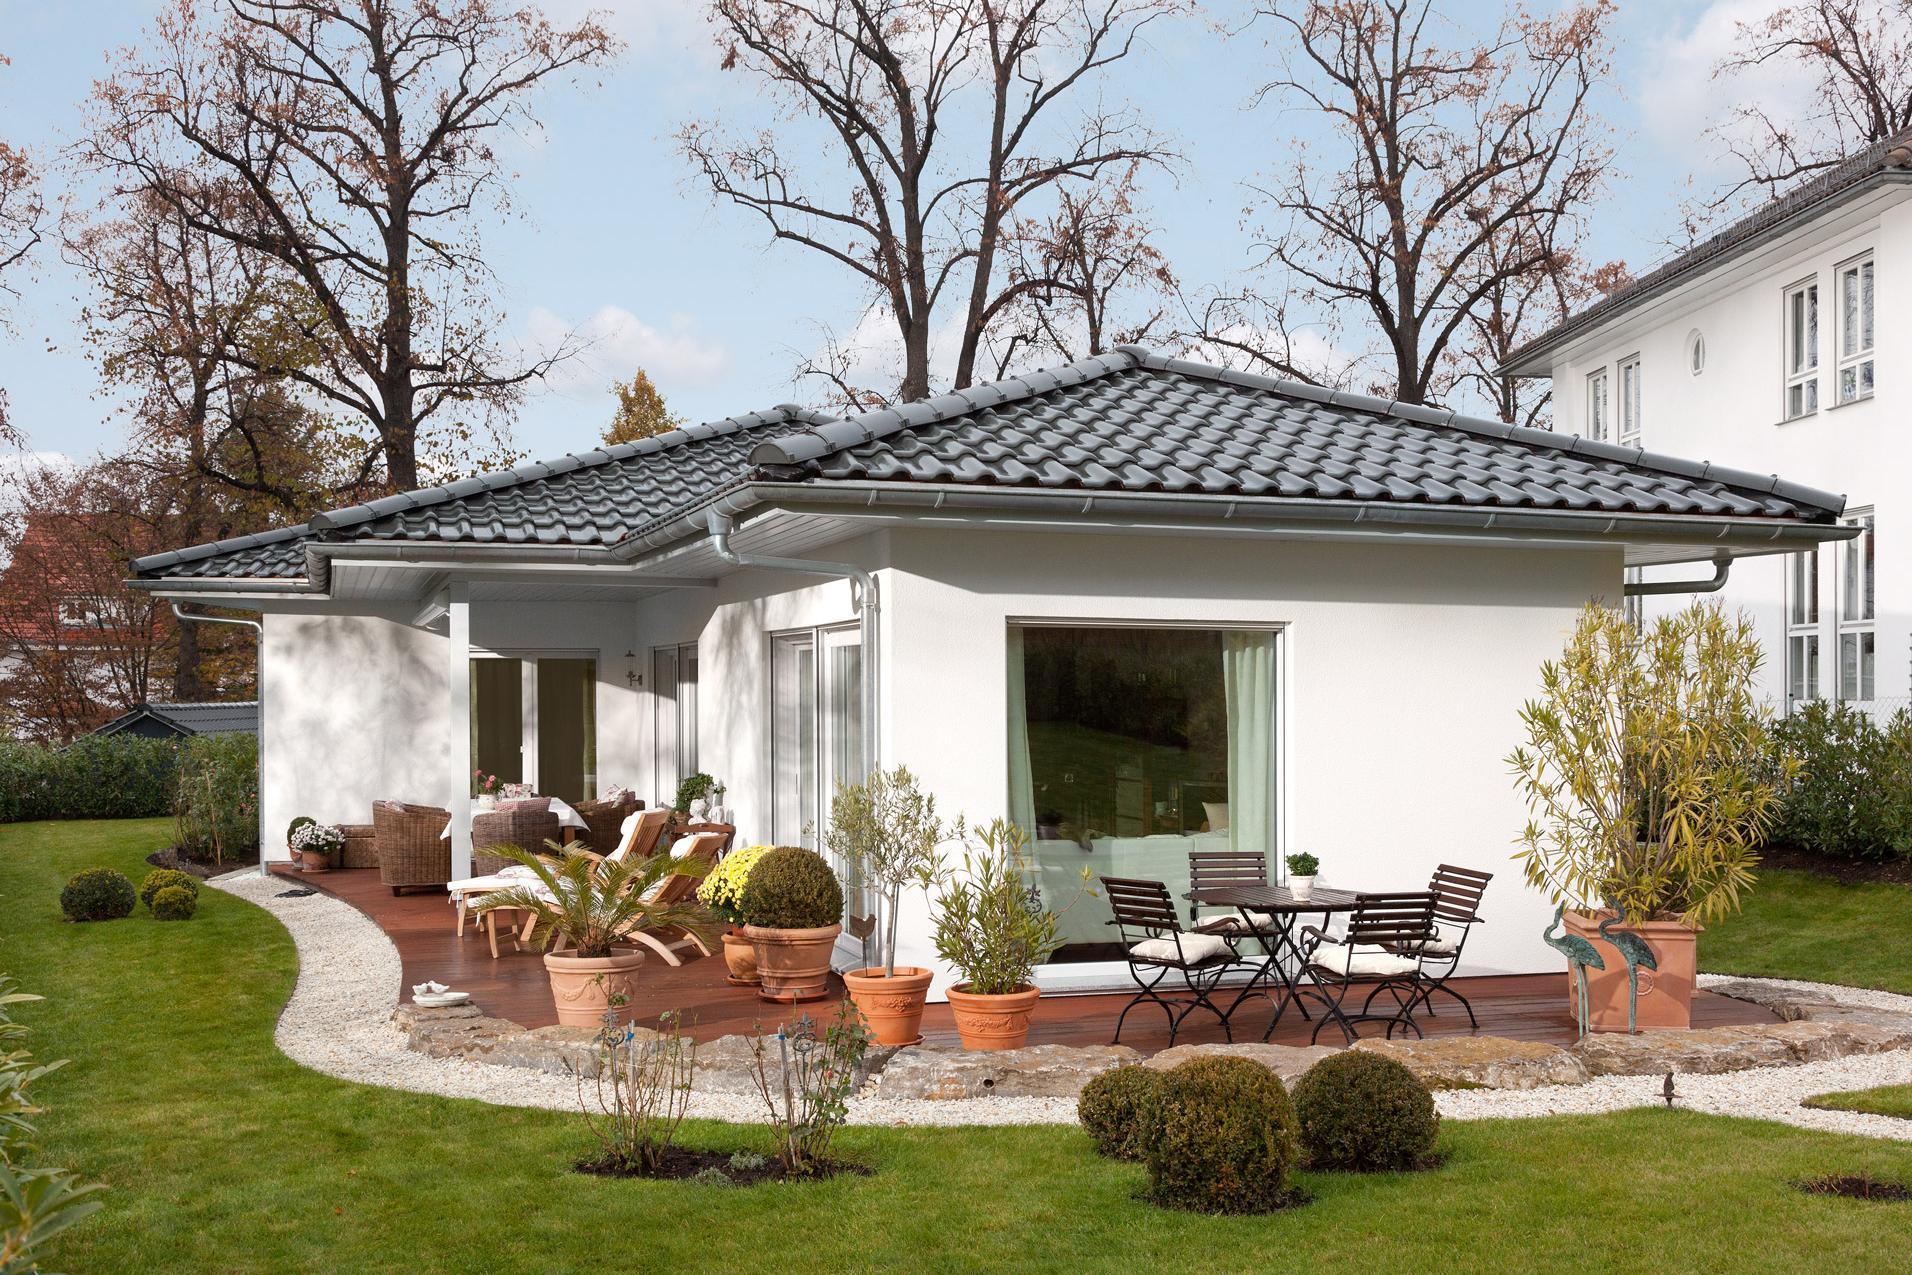 Bungalow avec terrasse couverte | SchwörerHaus